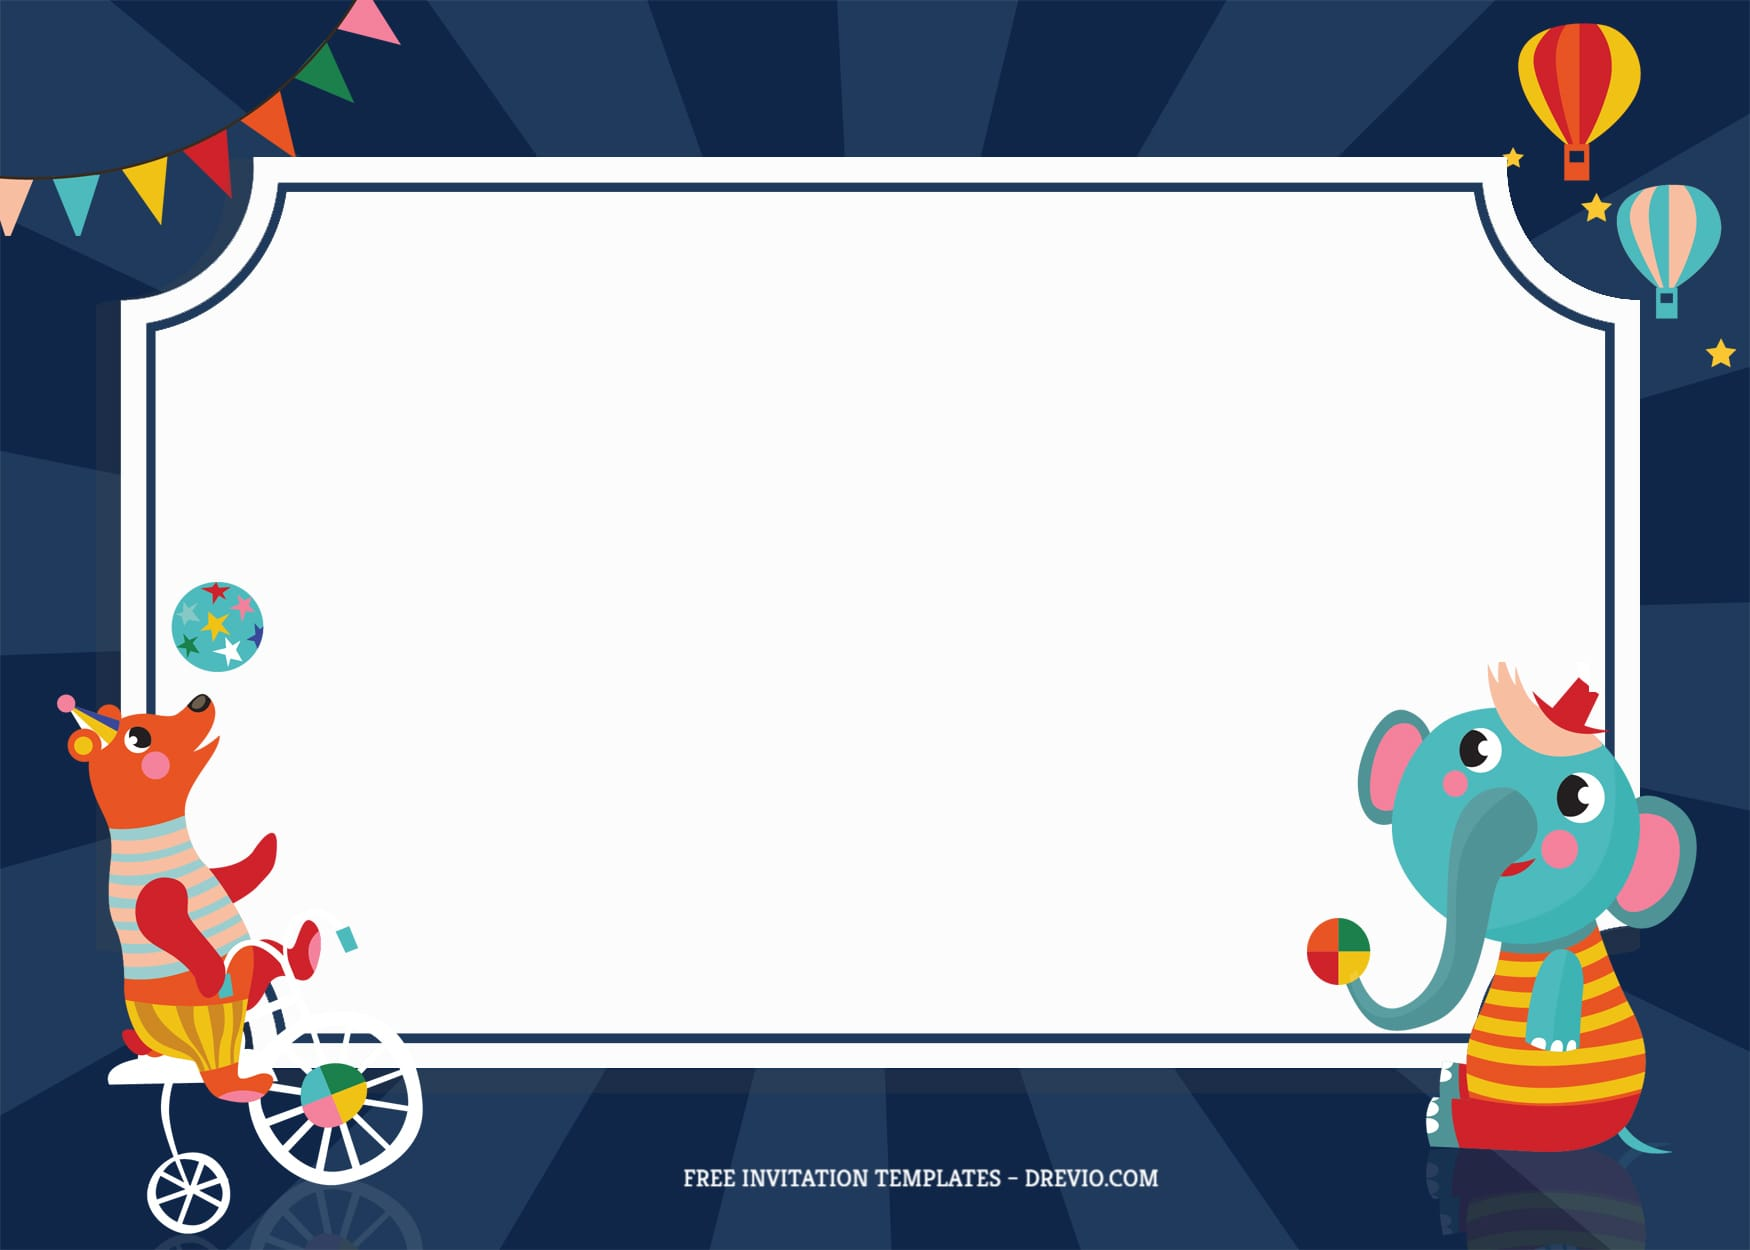 7+ Festive Carnival Party Birthday Invitation Templates With Elephant And Bear